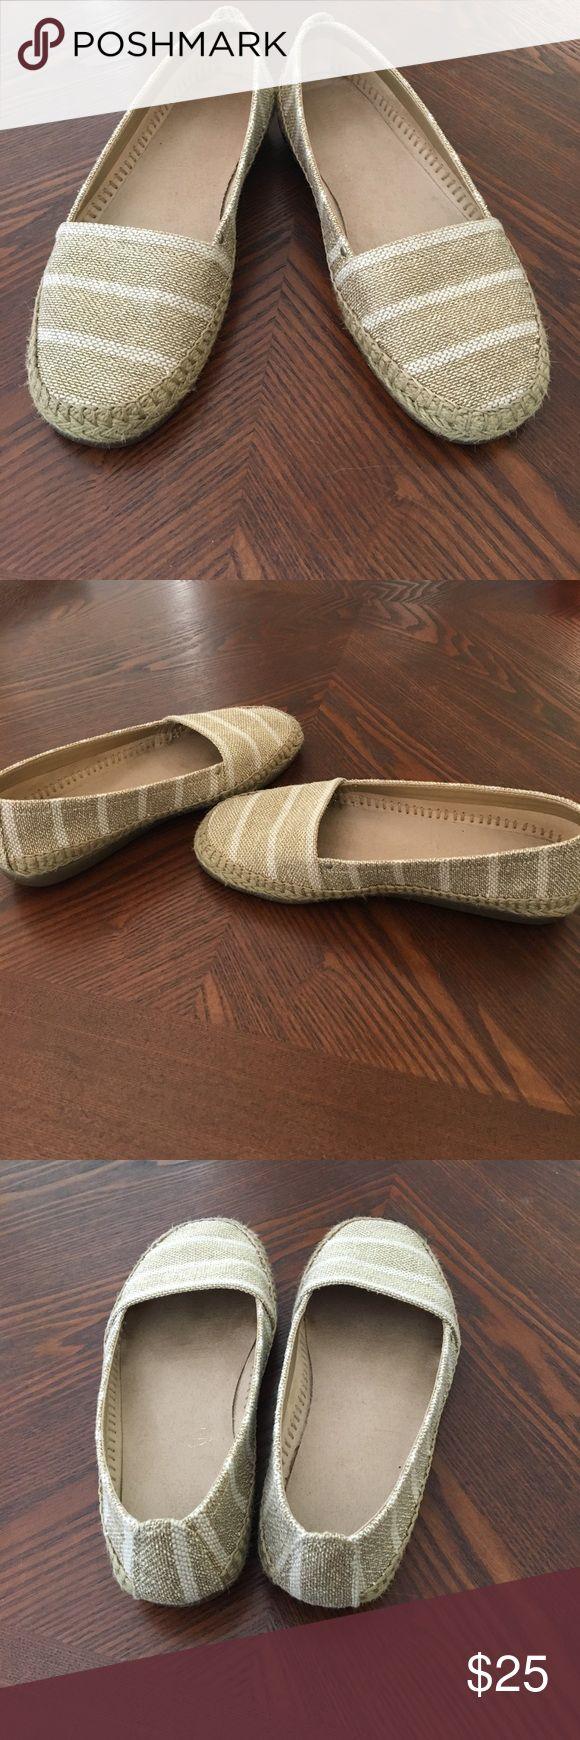 Aerosoles Solitaire Espadrilles Ladies Aerosoles Size 6.5, Natural Gold Fabric w/ Braided Rope Trim, Slip-on w/ Memory Foam Insole, Diamond Pattern Rubber Sole, Comfortable Shoe!  Worn, Still in Good Condition! AEROSOLES Shoes Espadrilles